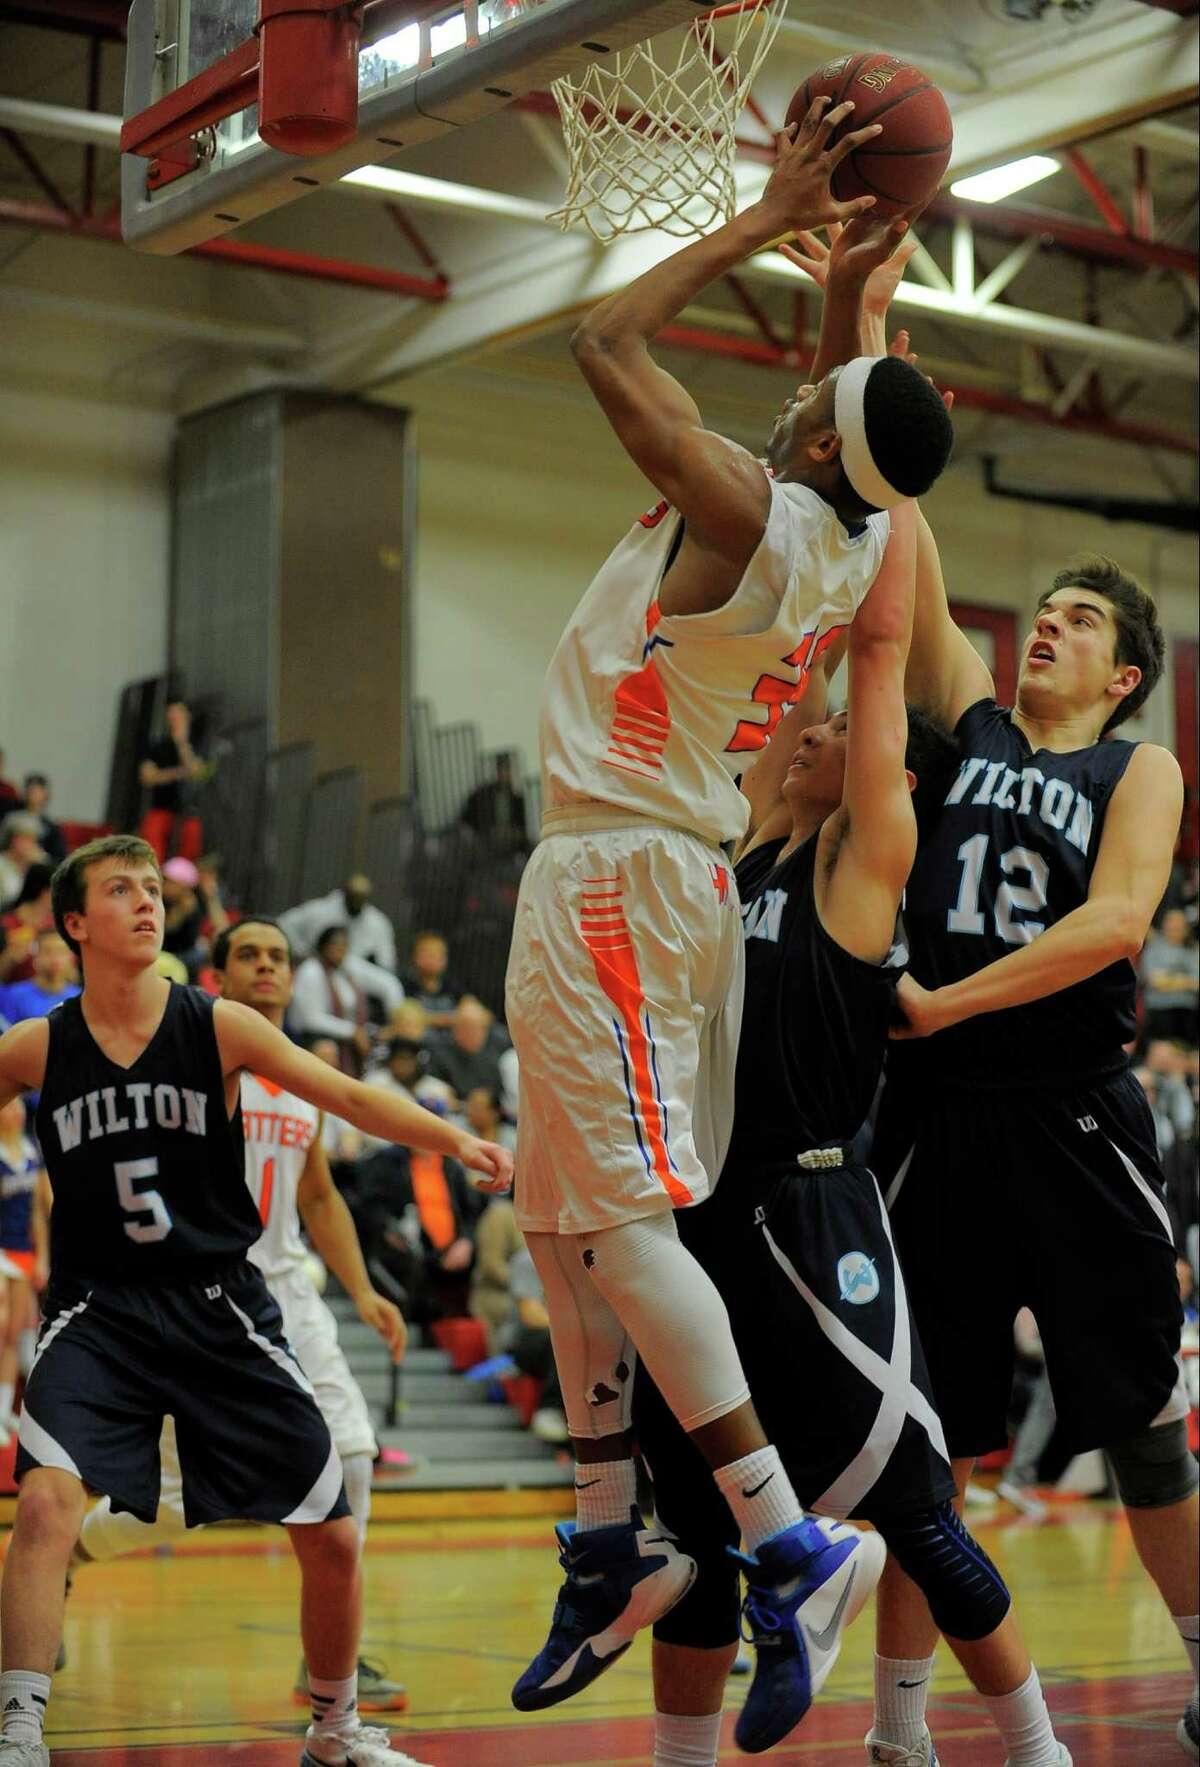 Men's Basketball U.S. high school participants: 541,054NCAA participants: 18,320Source: NCAA